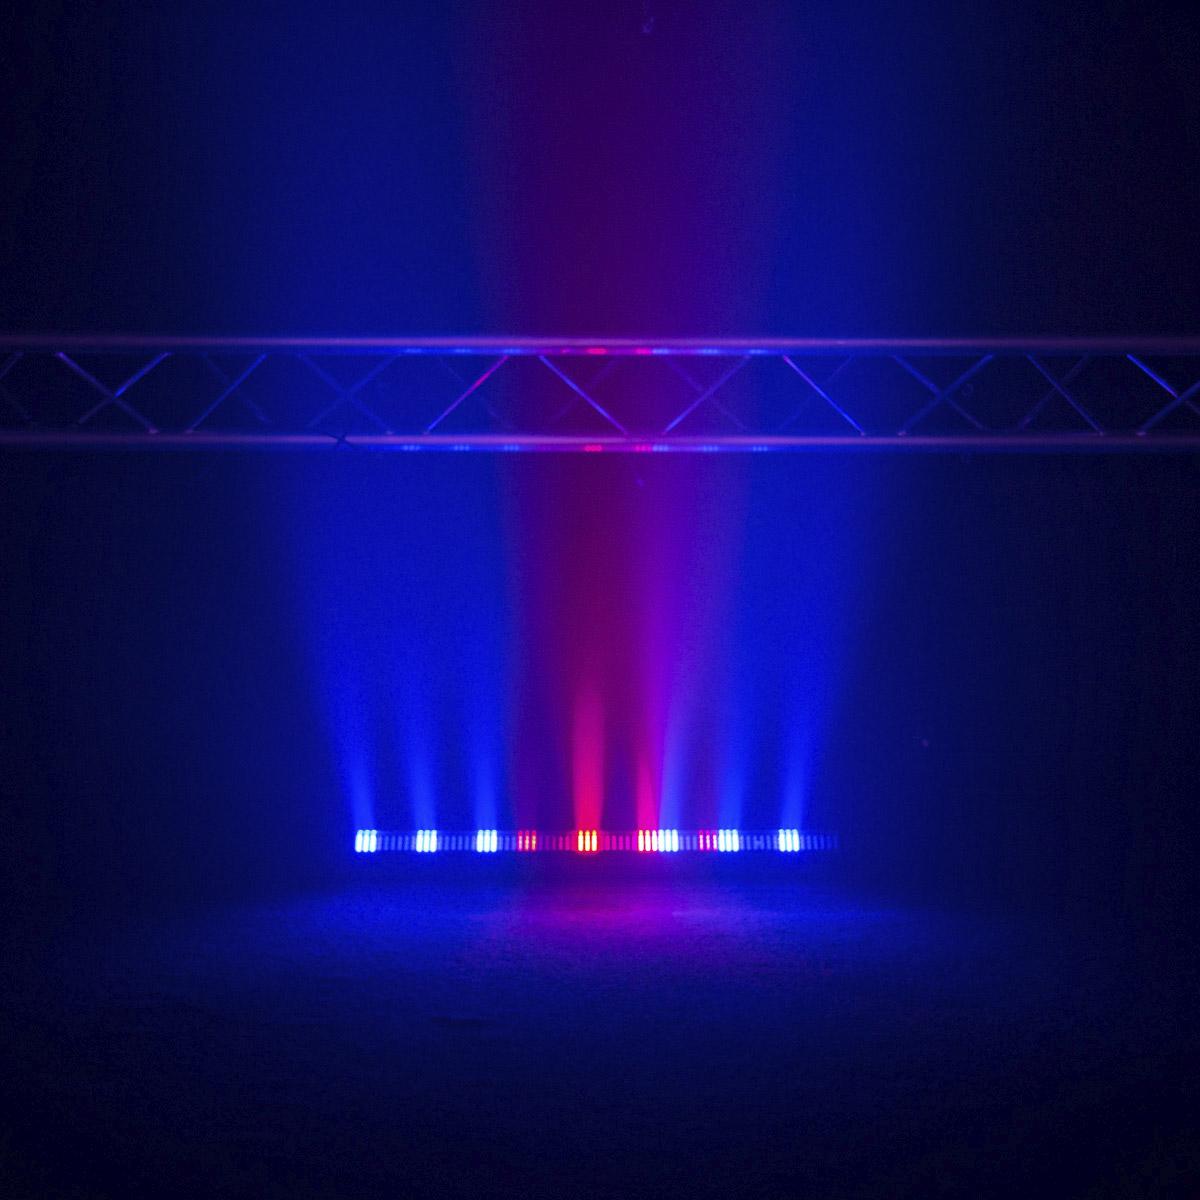 Sky Bar 288 LED V2